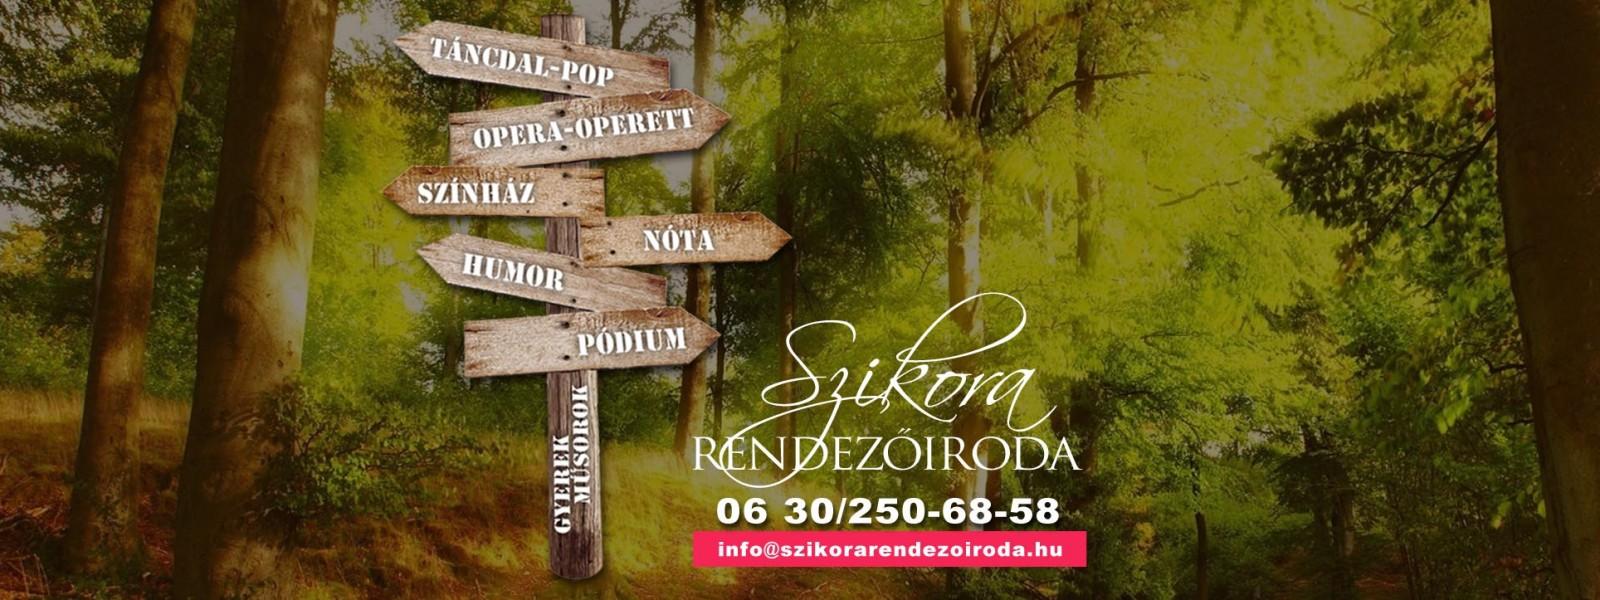 Szikora Rendezőiroda